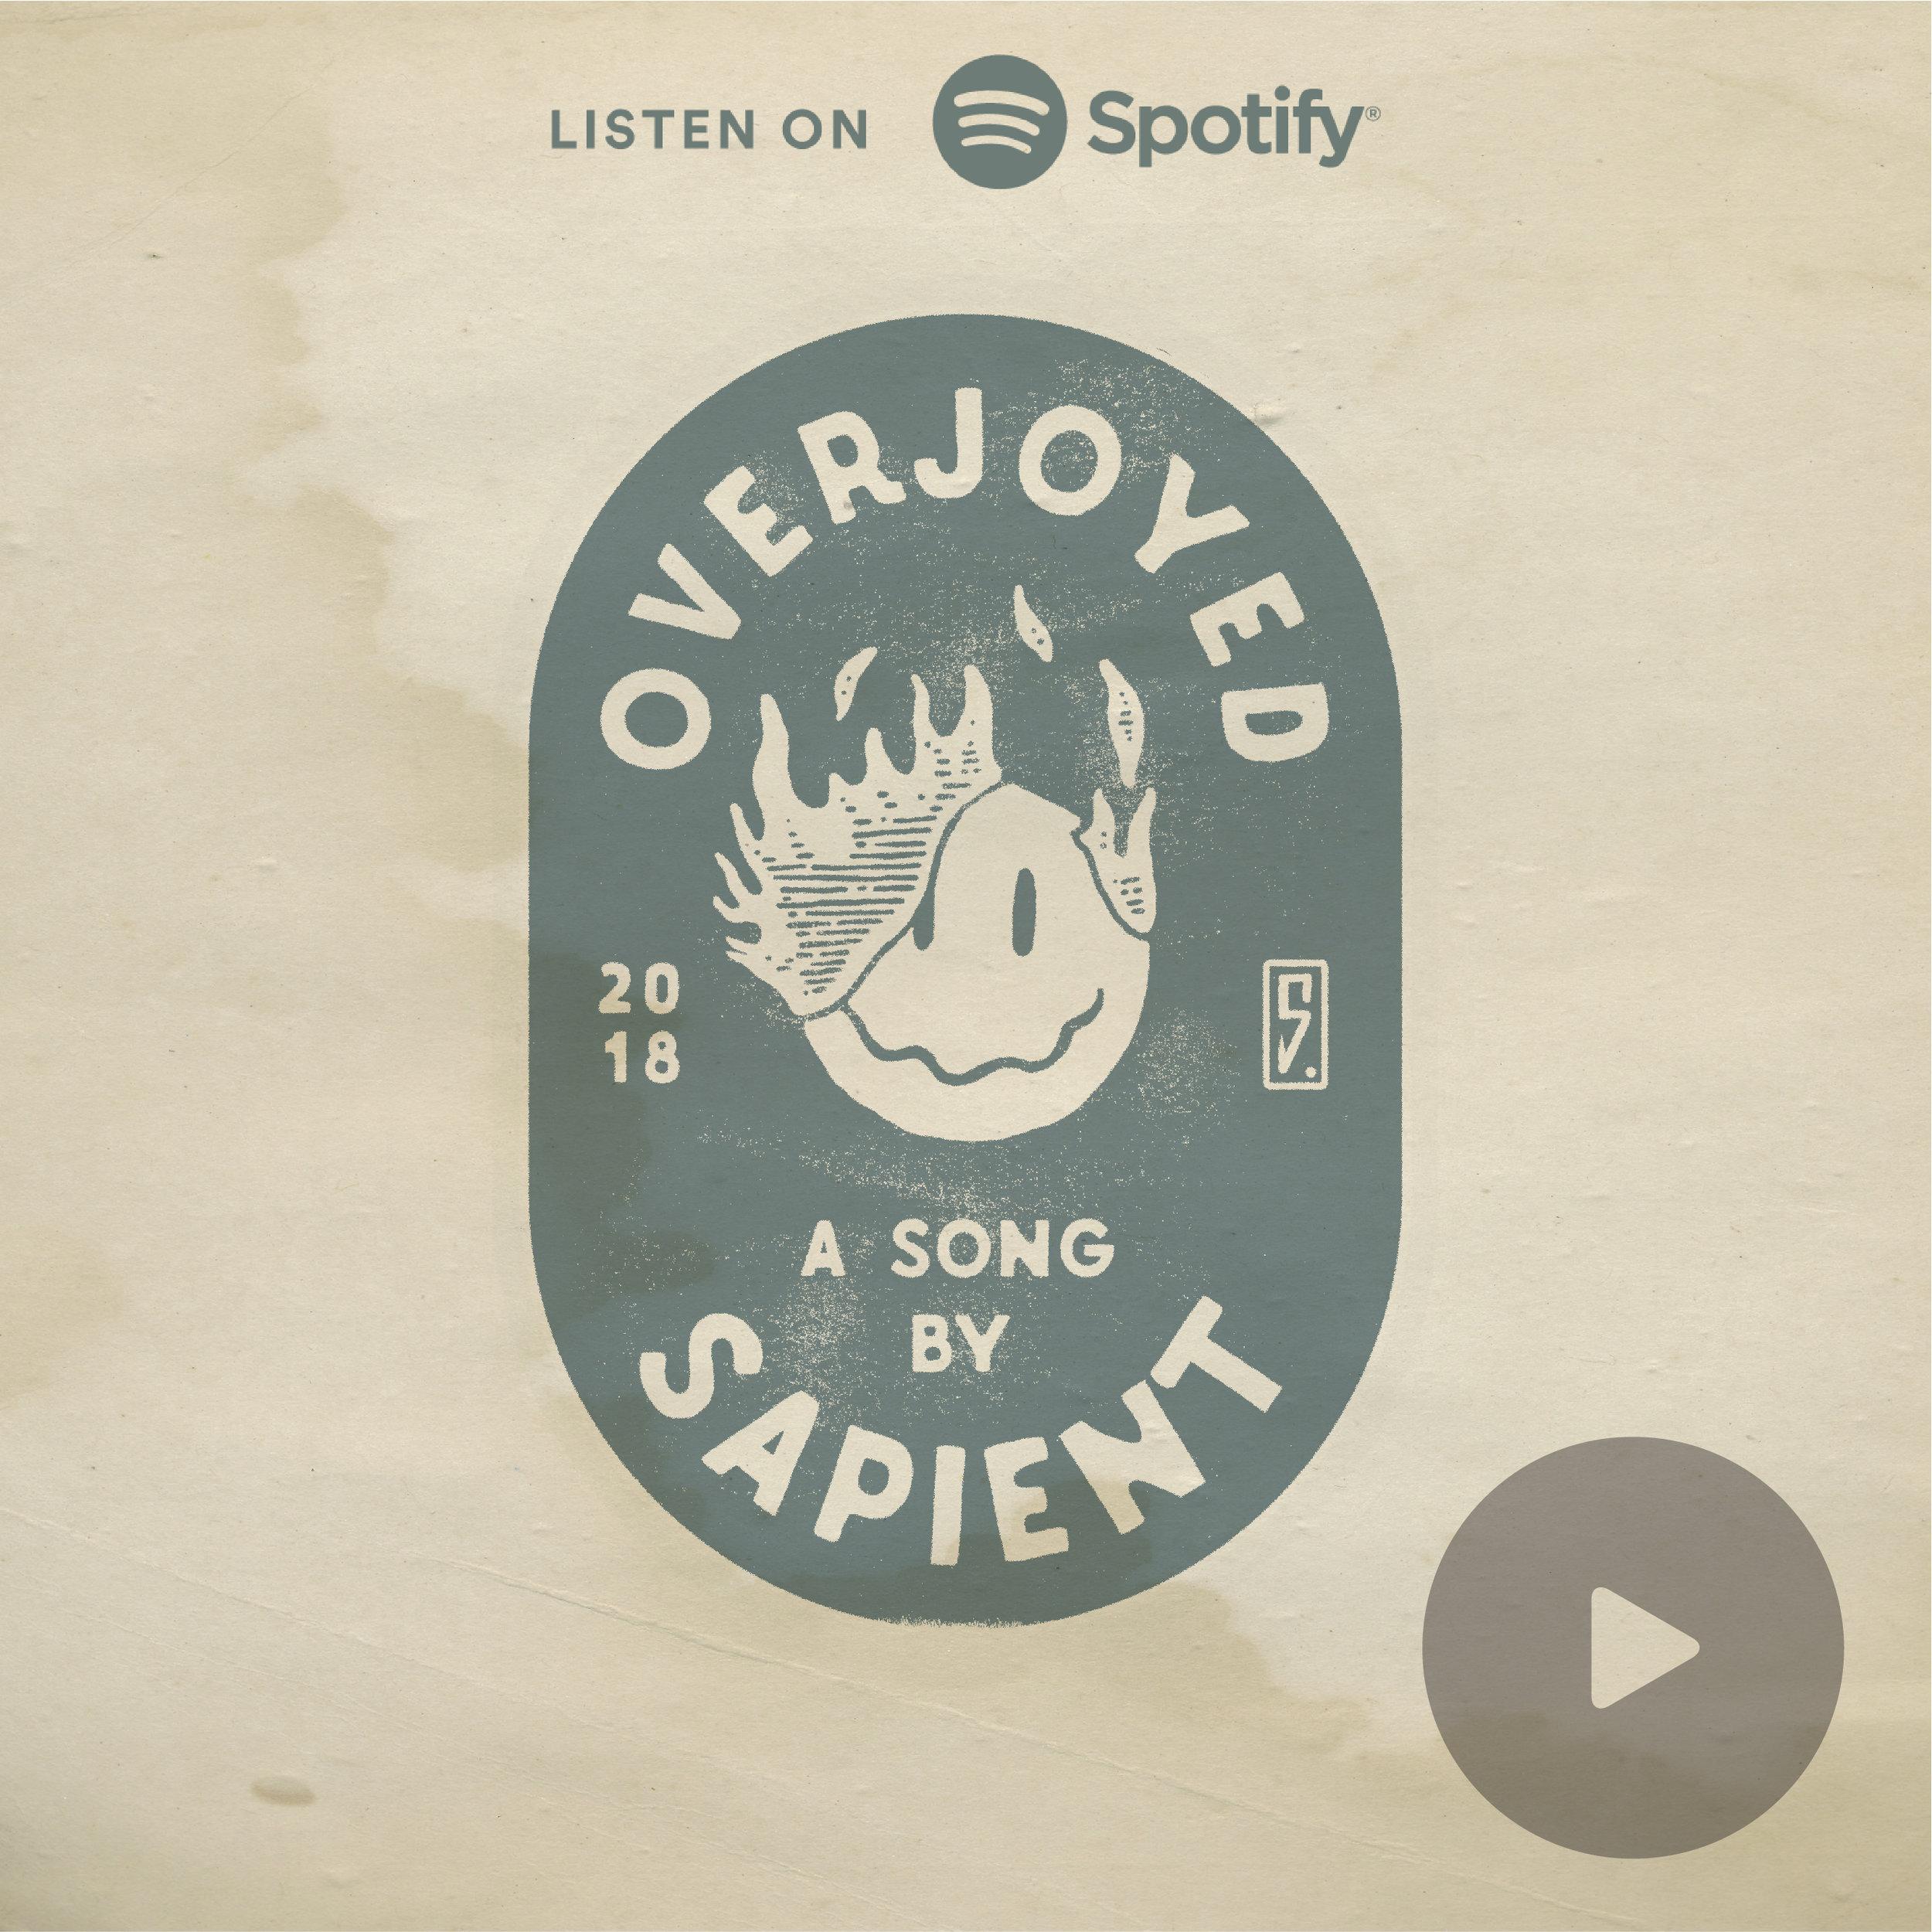 OVERJOYED - Peep the lyrics HERE